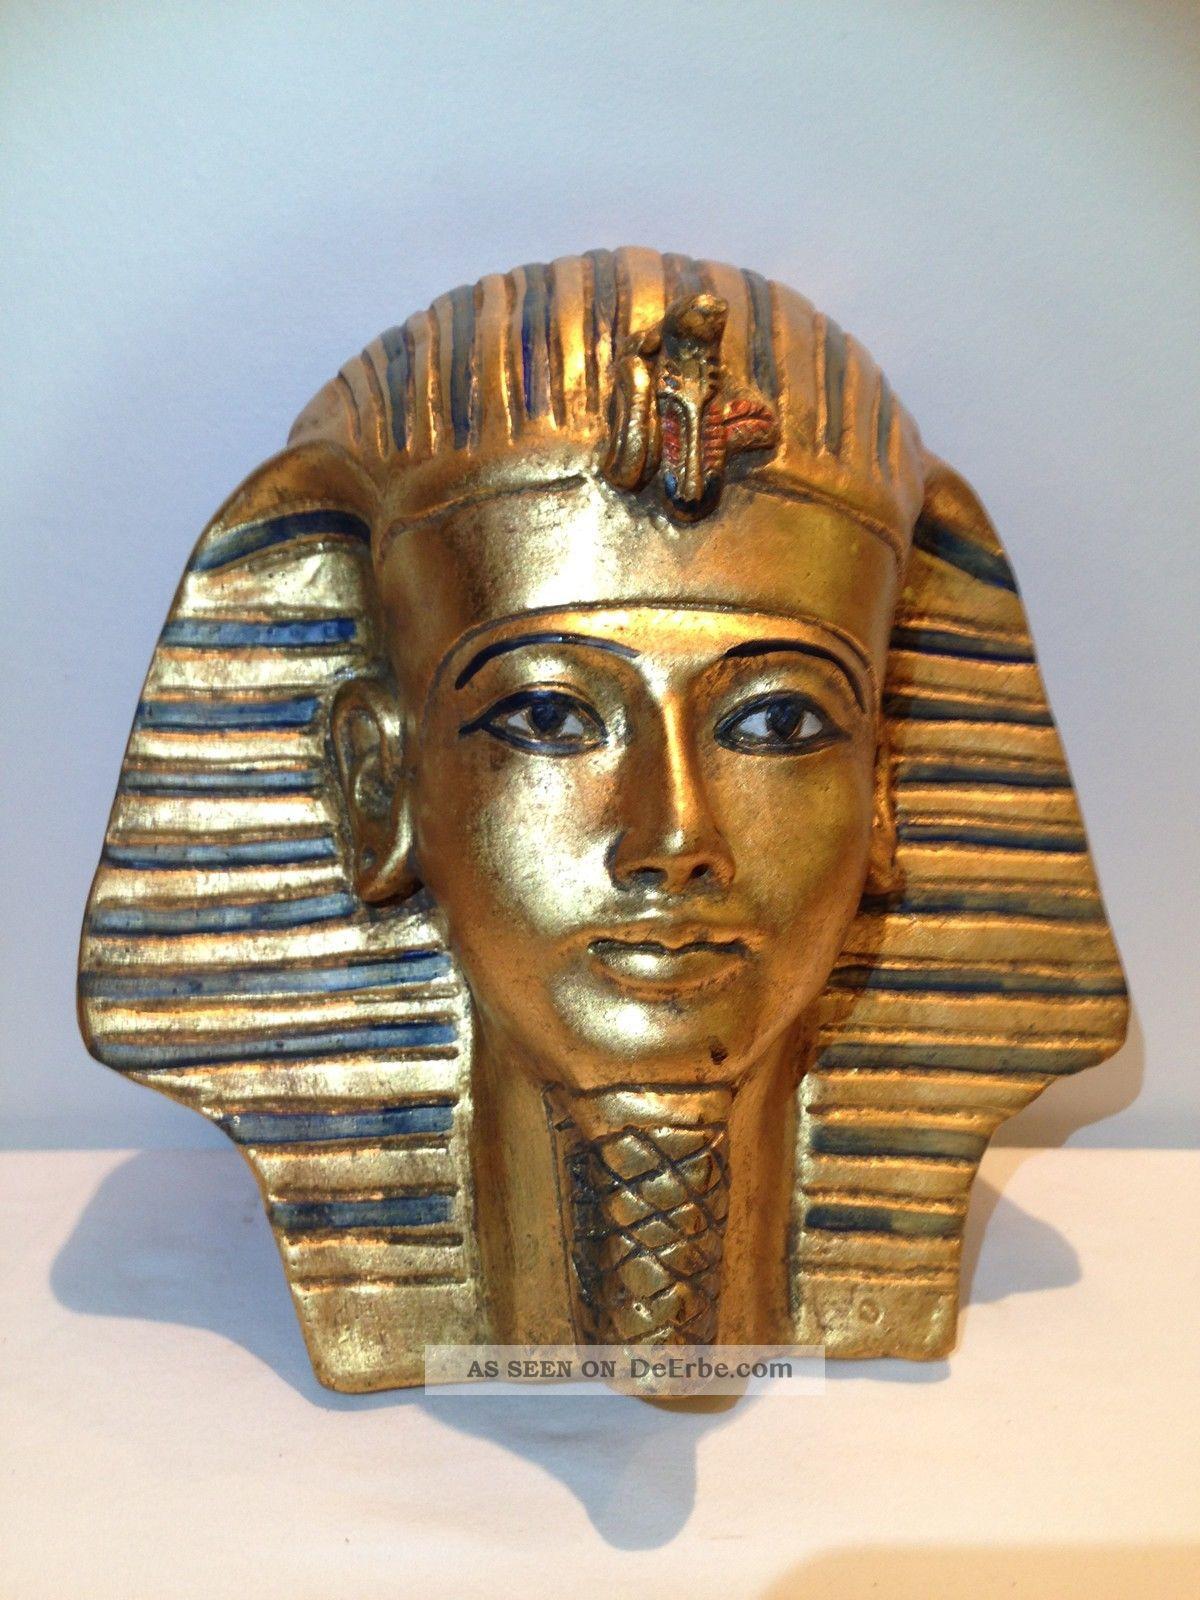 Totenmaske Ägypten Pharao Tut Ench Amun, 33Cm ganzes Pharao Totenmaske